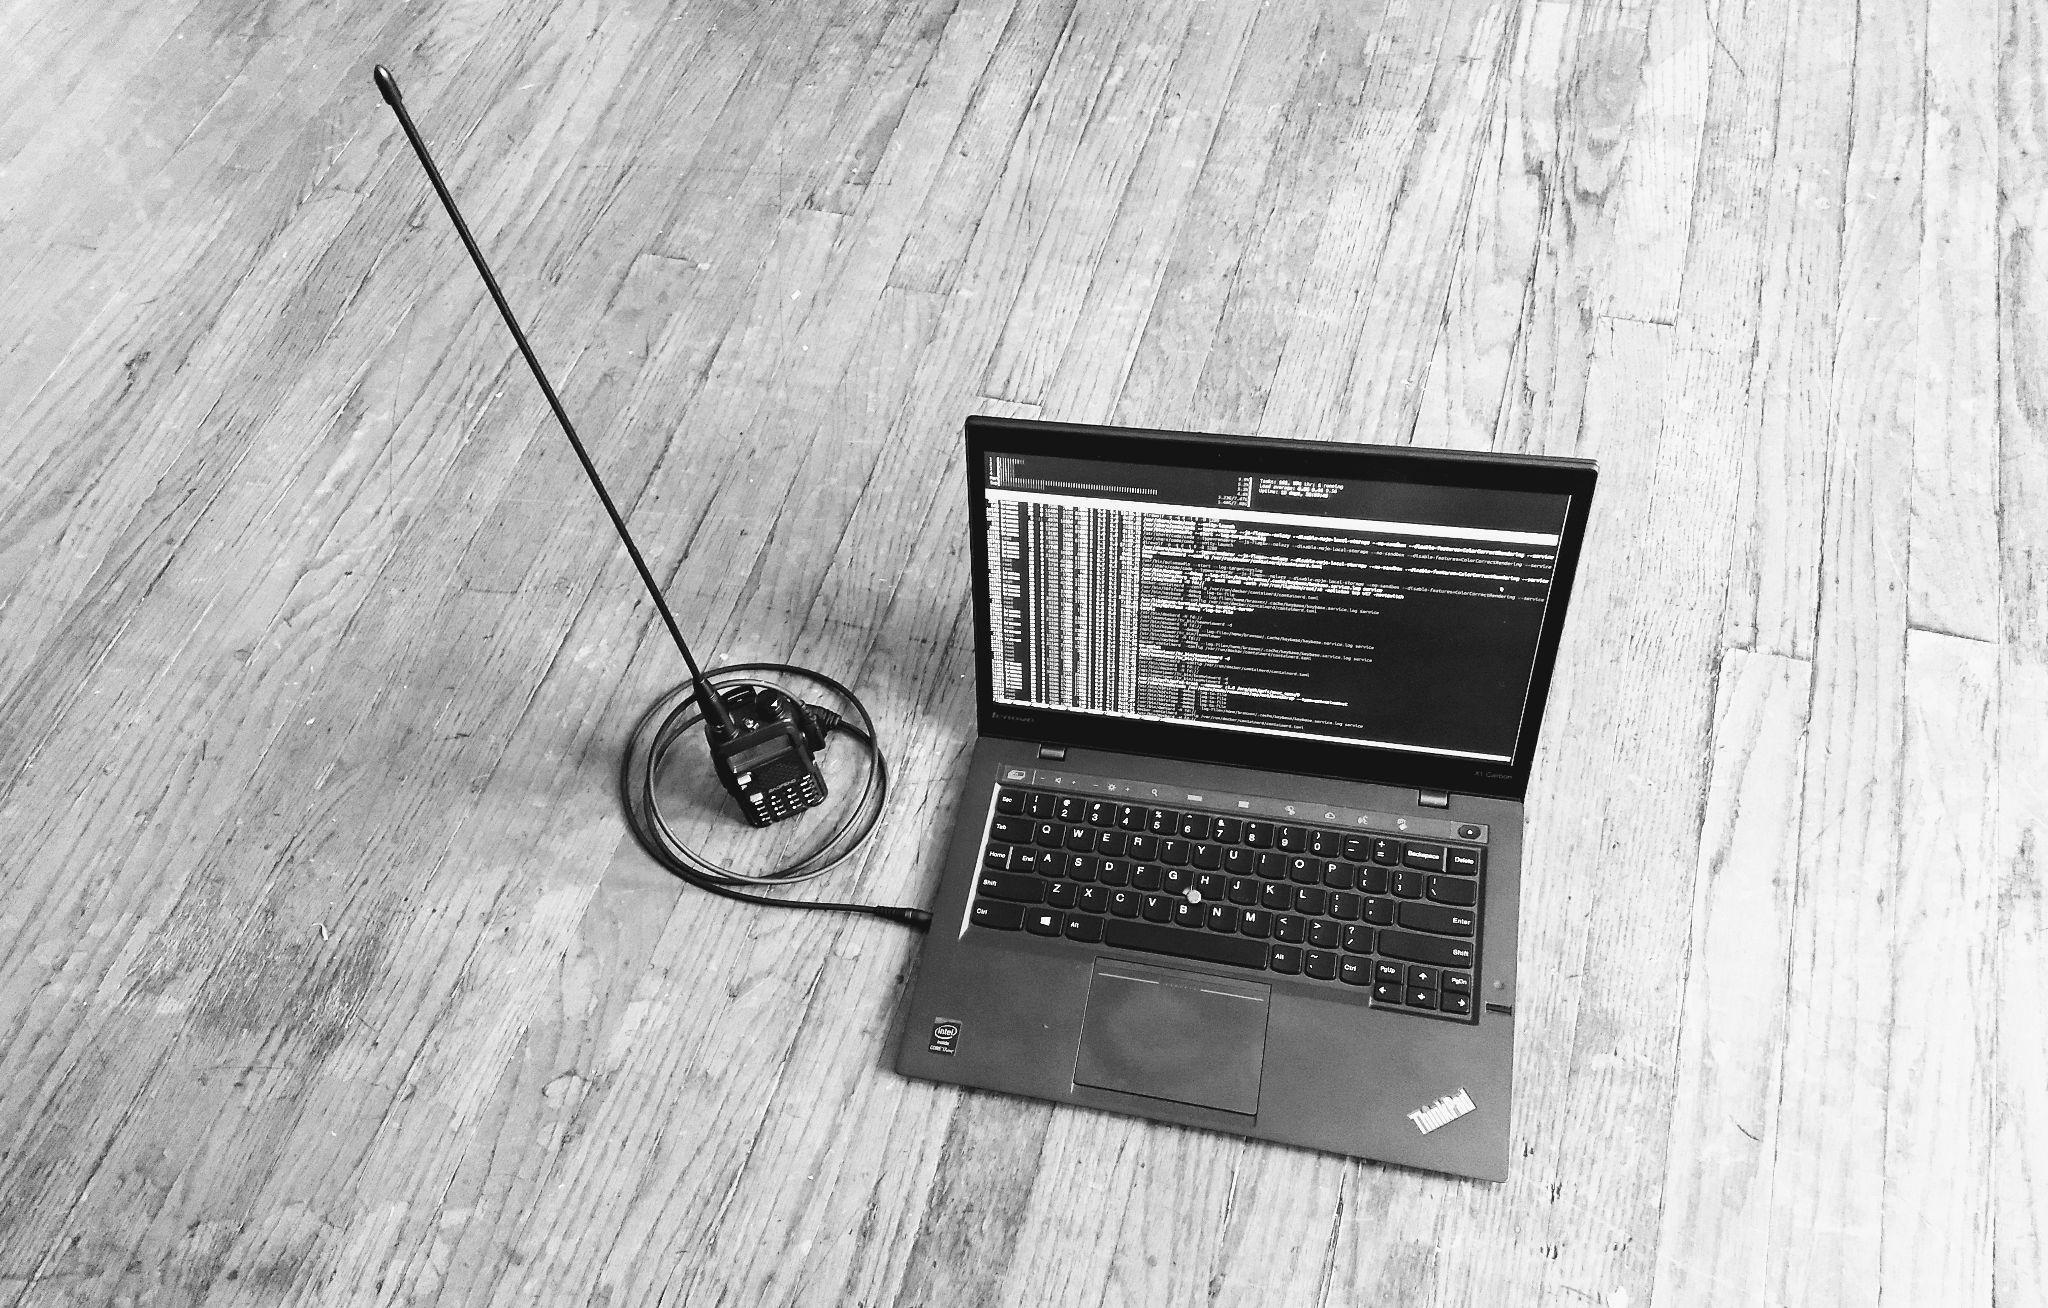 Baofeng UV-5R Linux setup